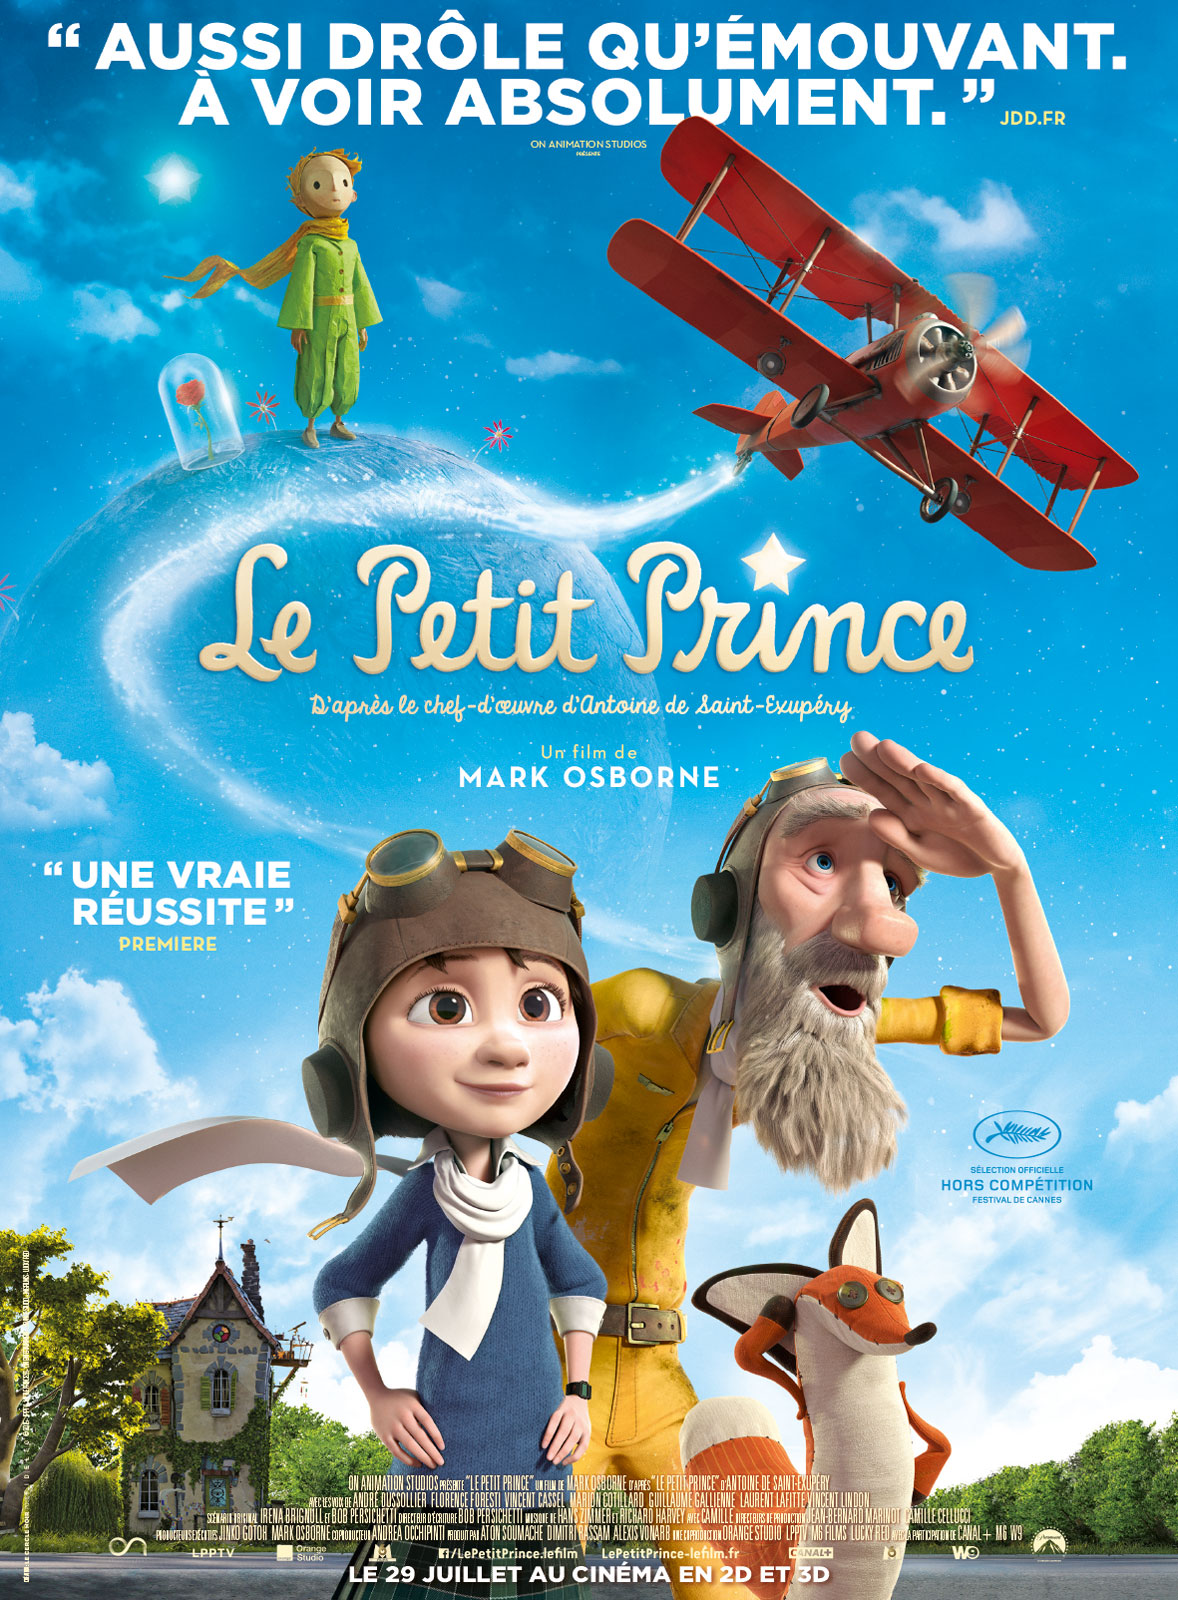 Le Petit Prince - film - Mark Osborne - Paramount - 2015 (3)